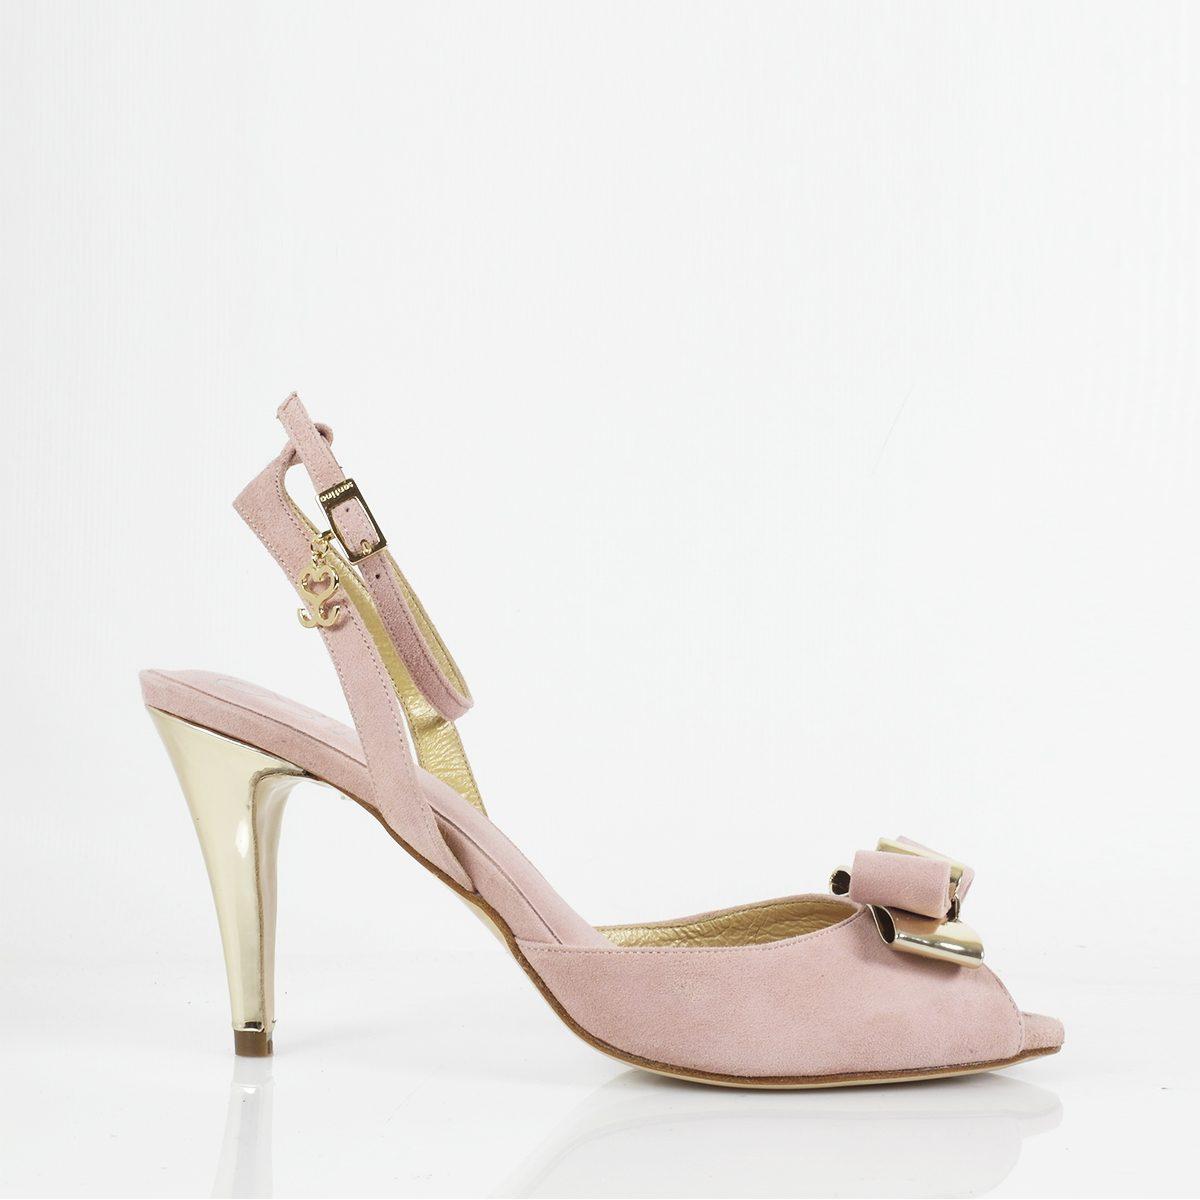 SANDALIA MOD.1920 (9cm) - Zapatos Personalizados Fiesta